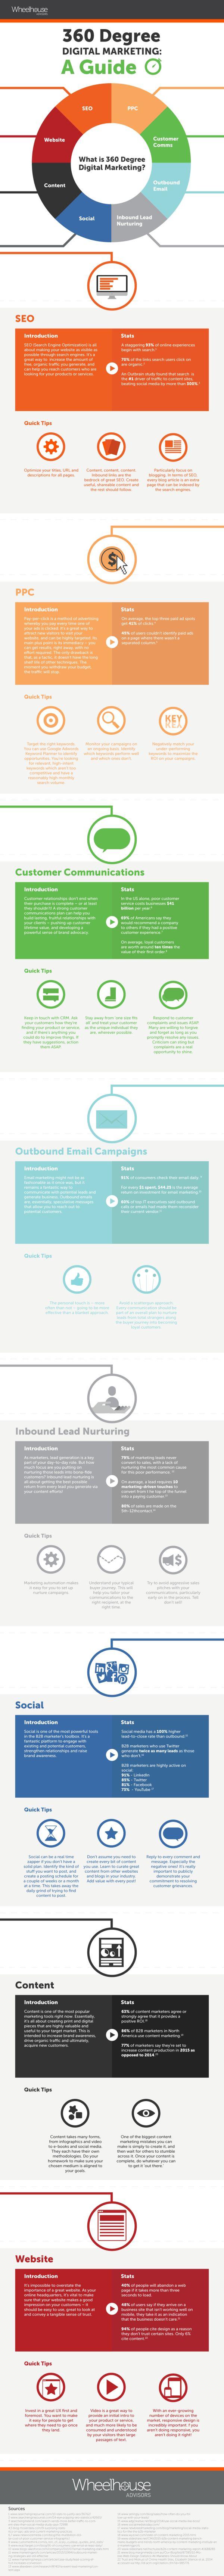 360 Degree Digital Marketing: A Guide [